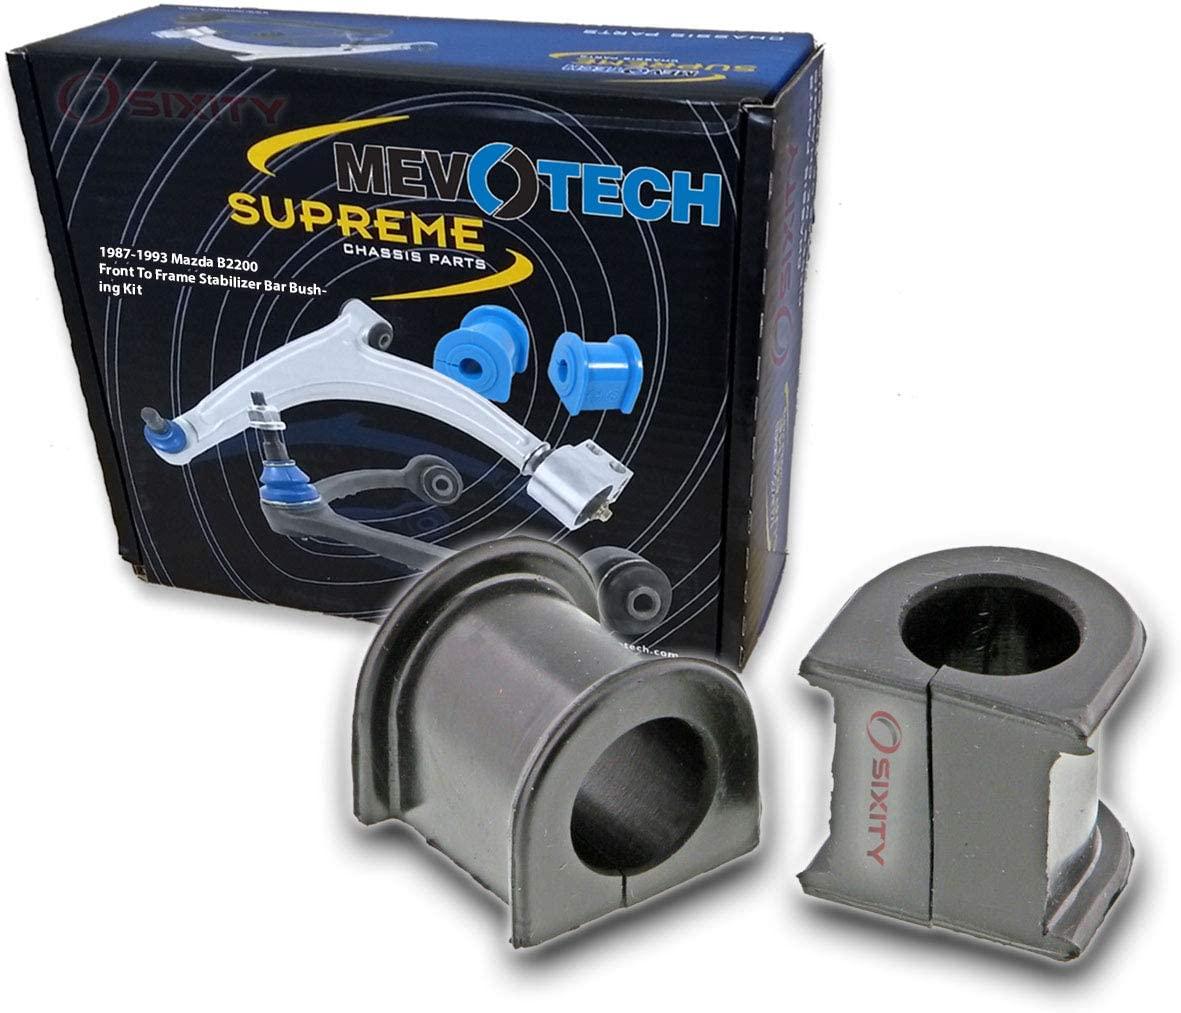 Mevotech Front To Frame Stabilizer Bar Bushing Kit for 1987-1993 Mazda B2200 - Suspension Springs Absorber